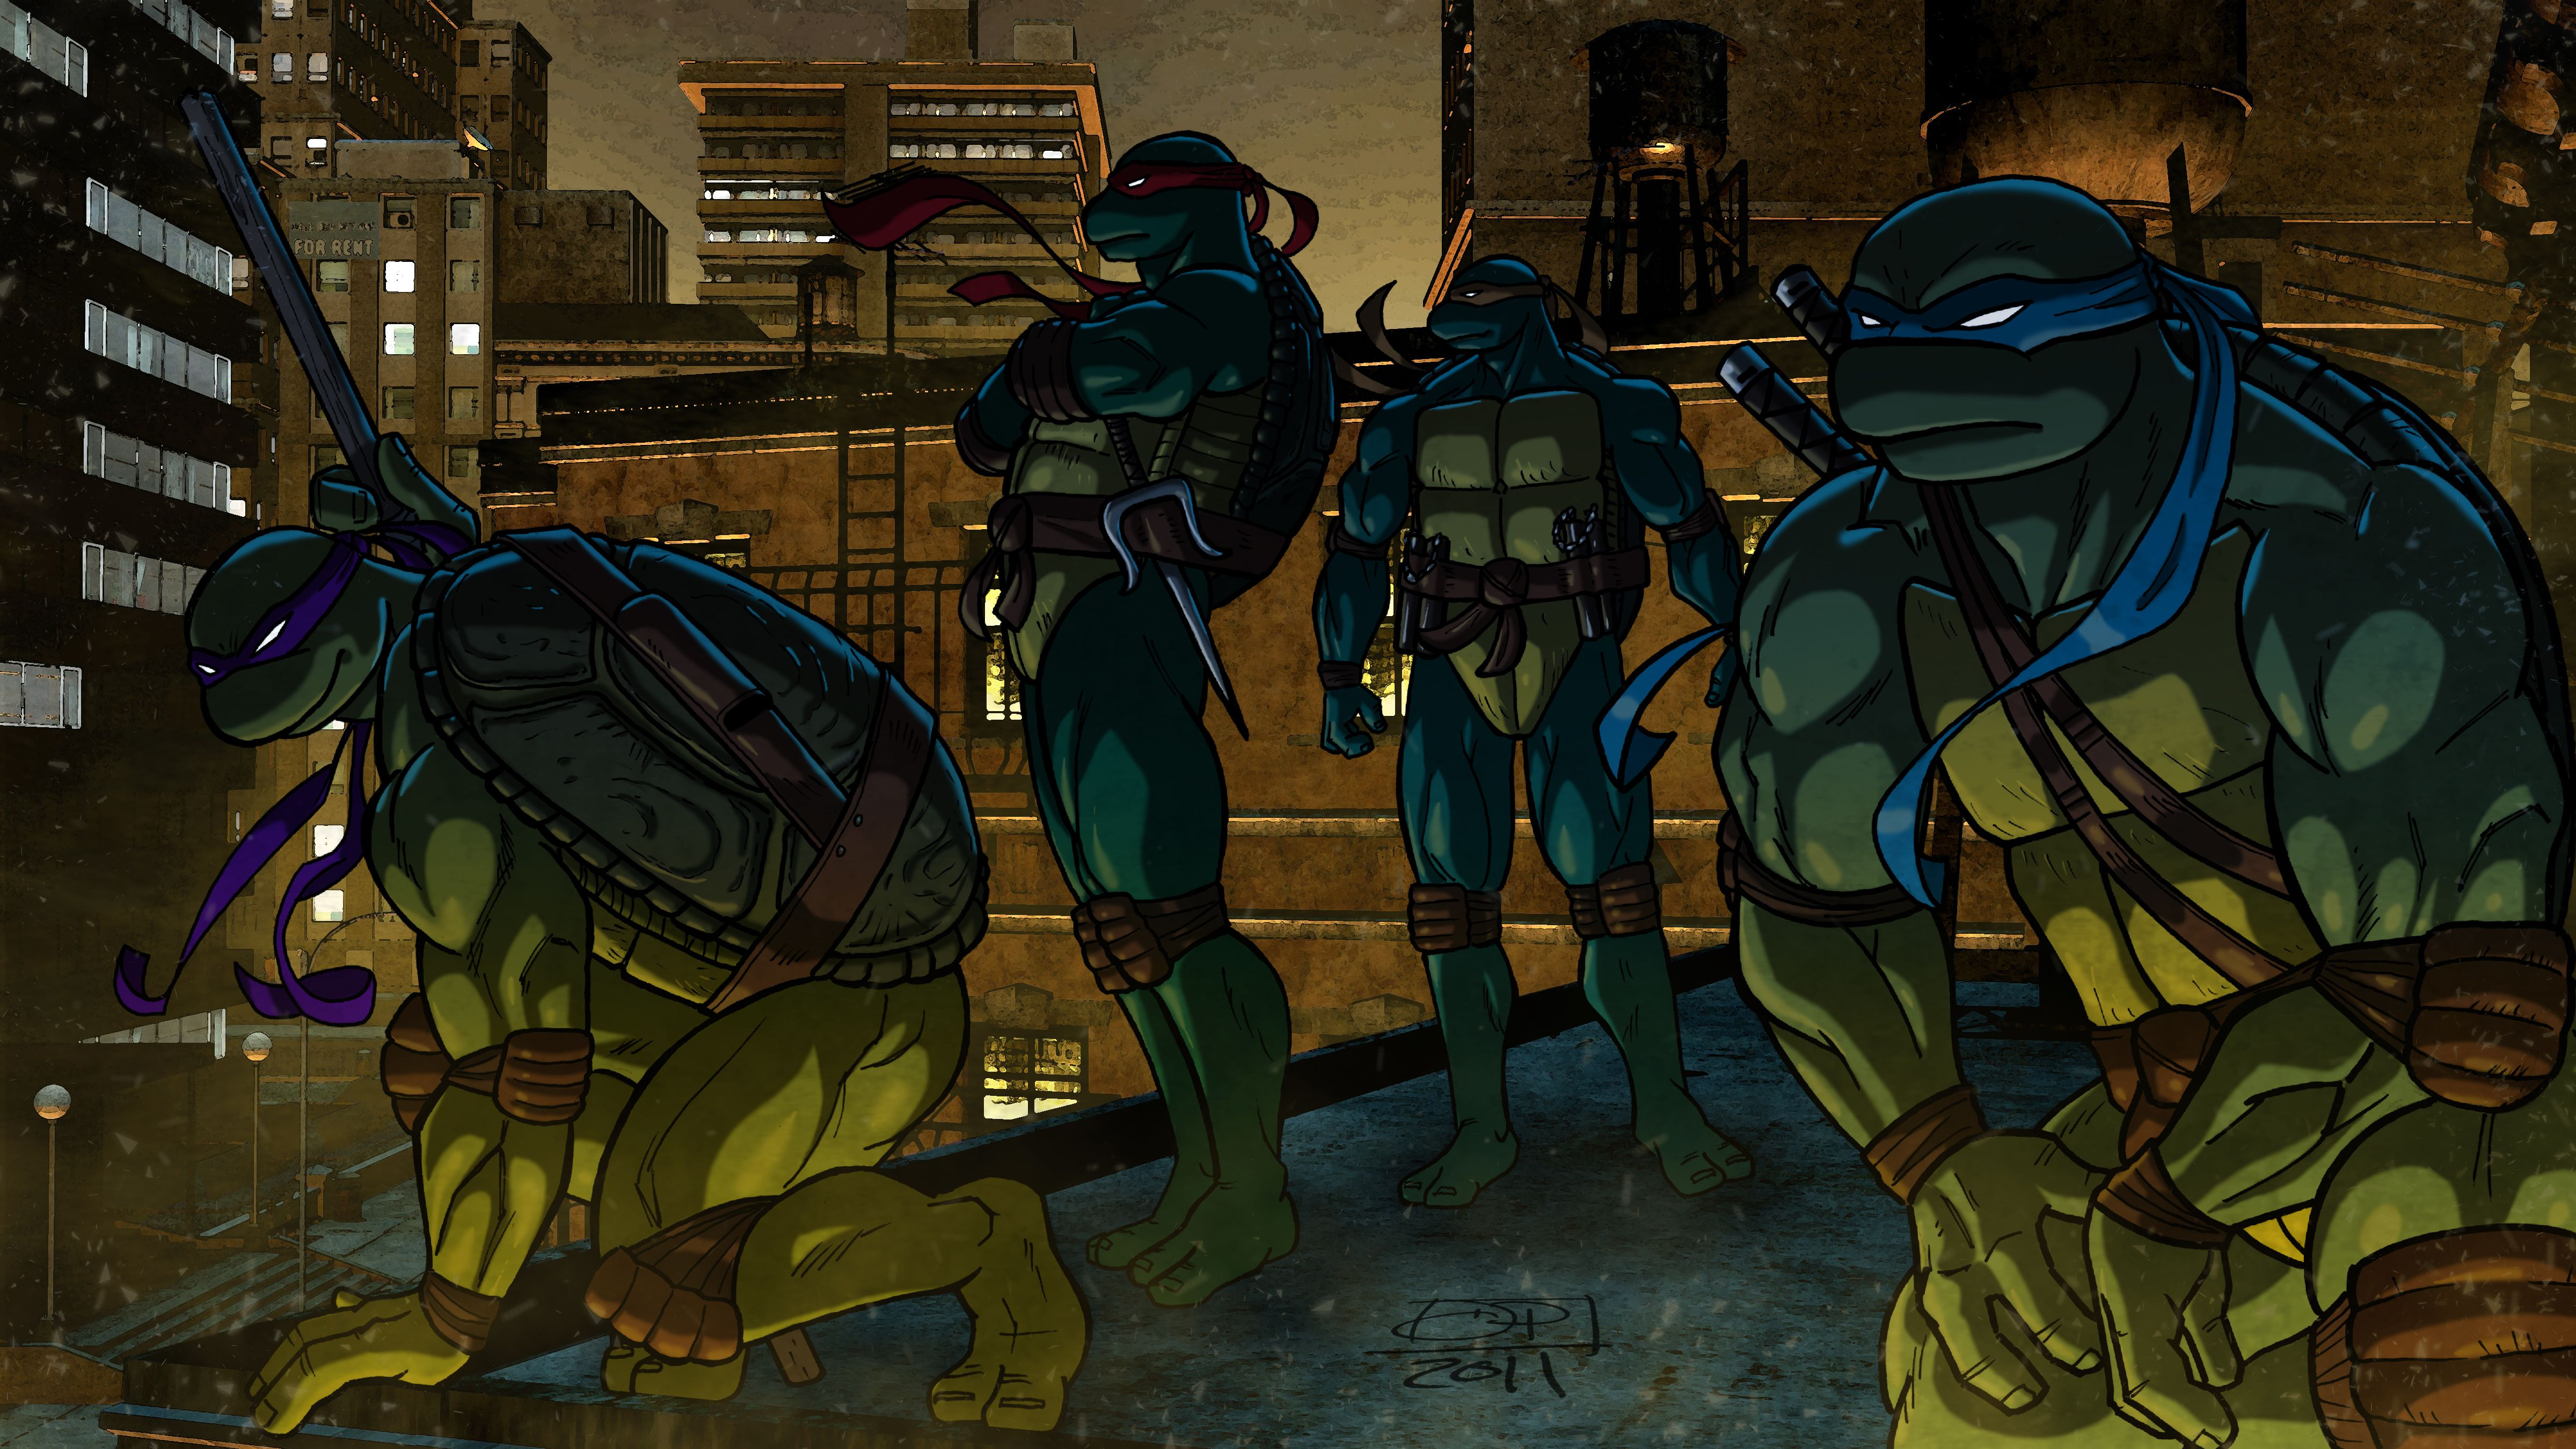 Teenage Mutant Ninja Turtles Warrior Cartoon wallpaper 4799x2700